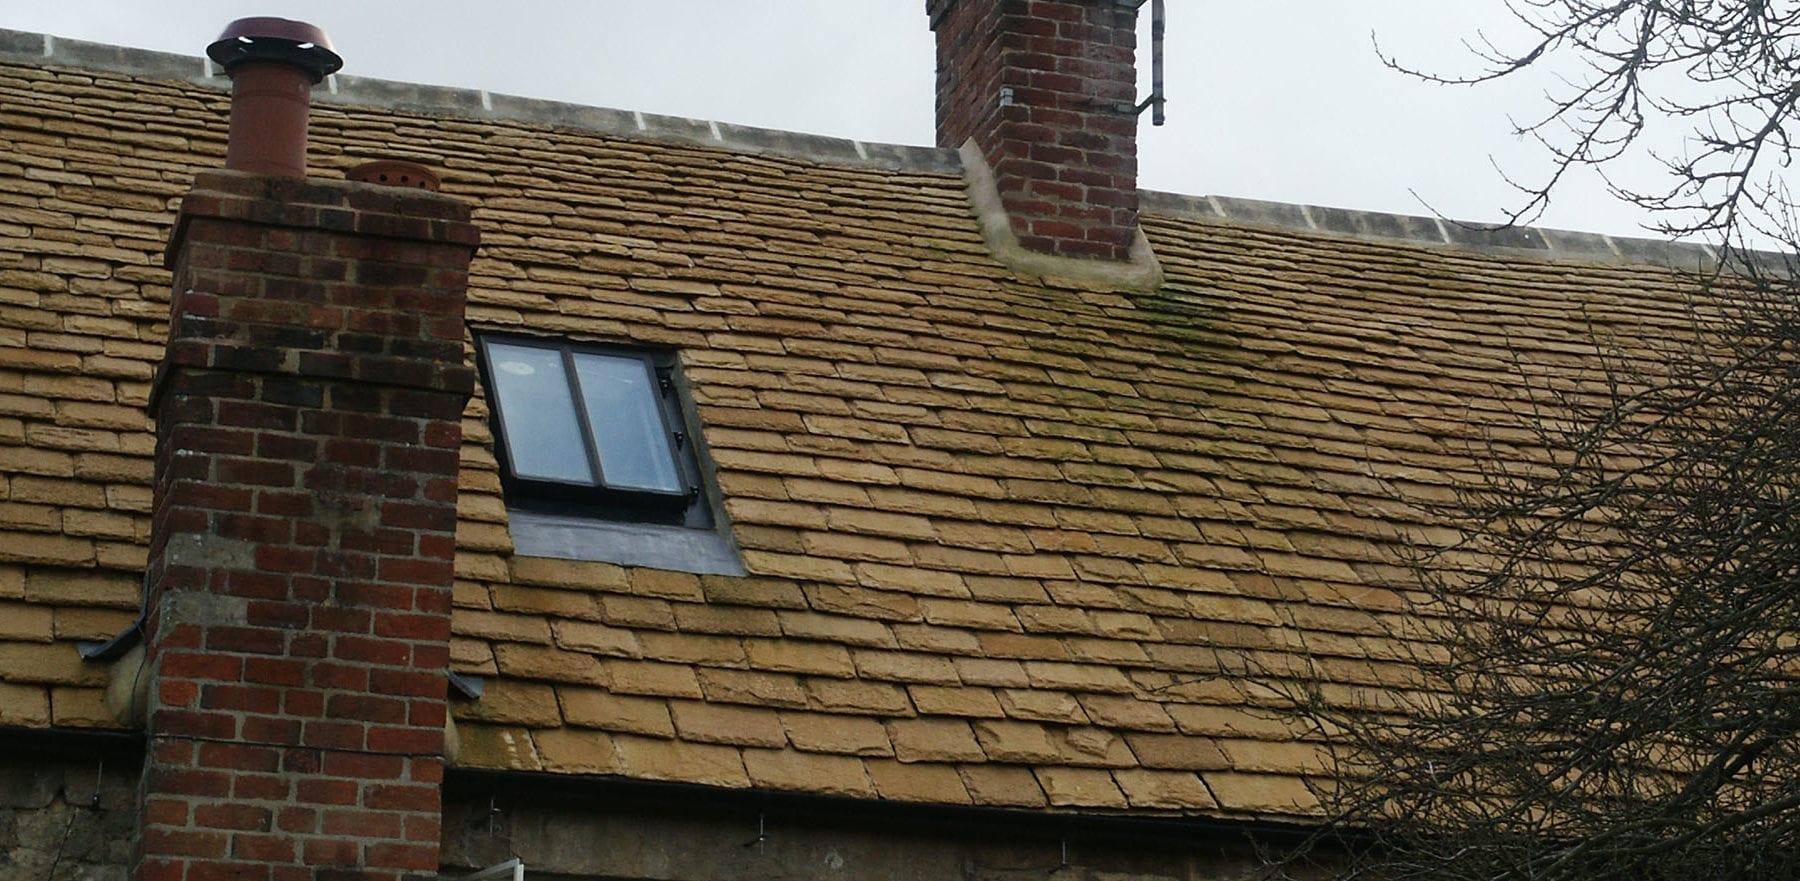 Lifestiles - Natural Stone Roof Tiles - On The Marsh, England 4